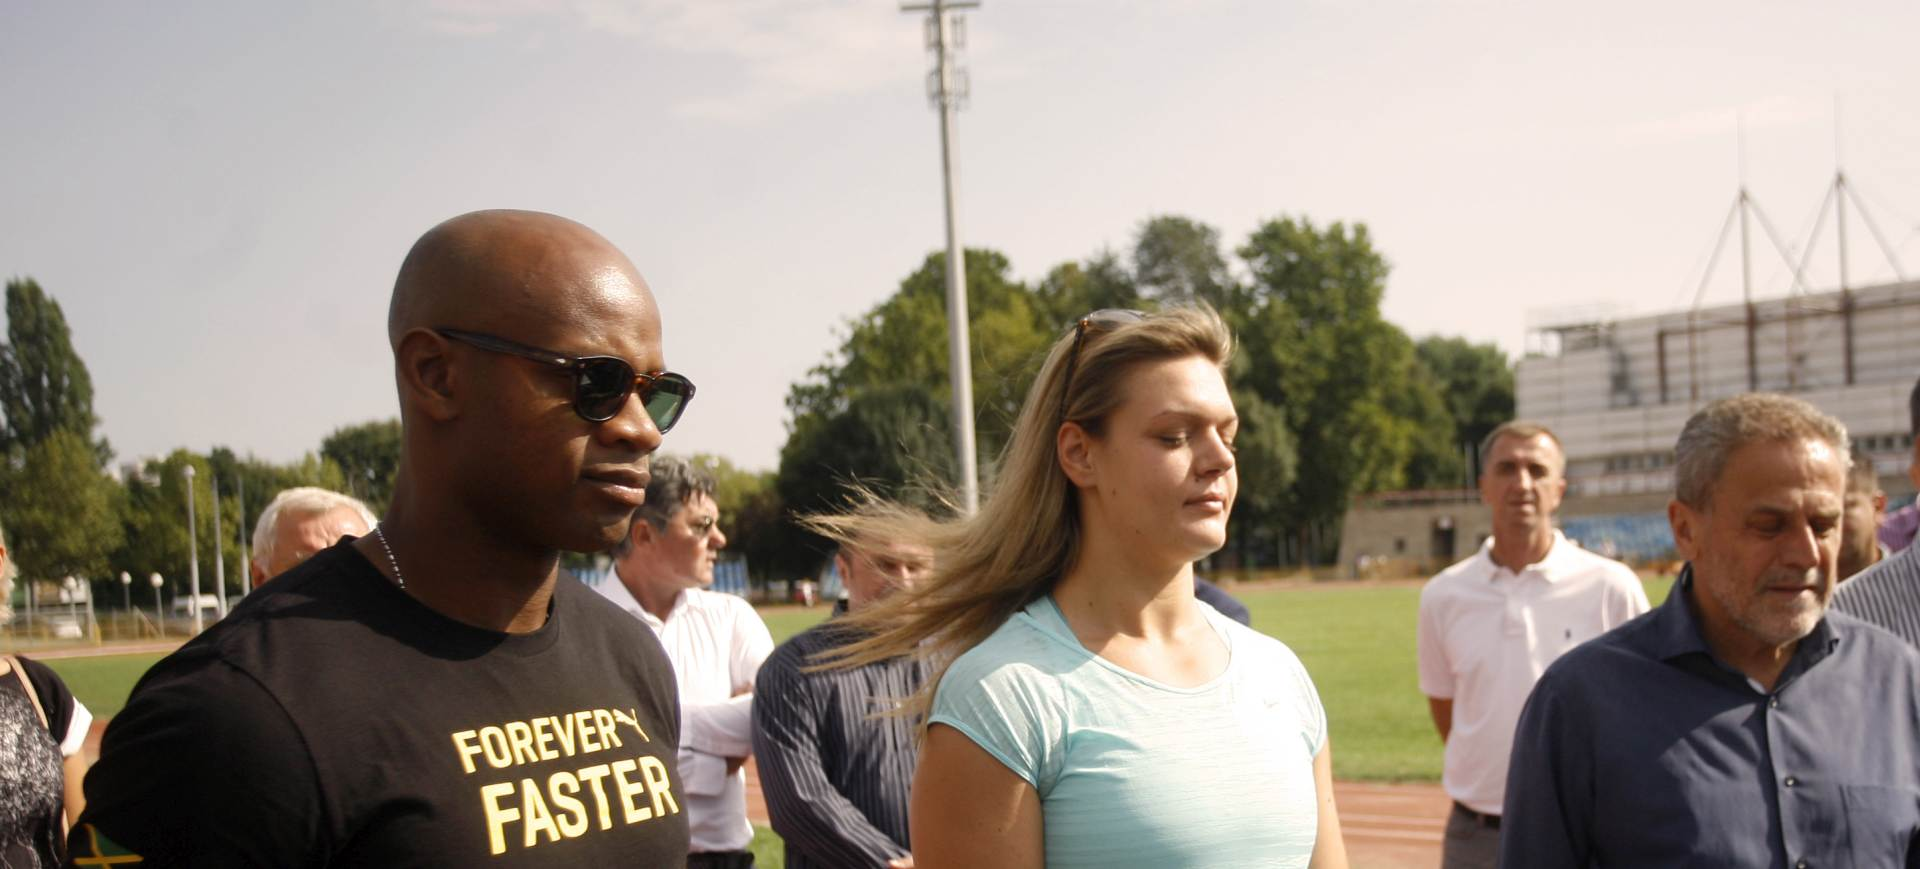 HANŽEK: Sandra Perković i Asafa Powell obišli stadion Mladosti